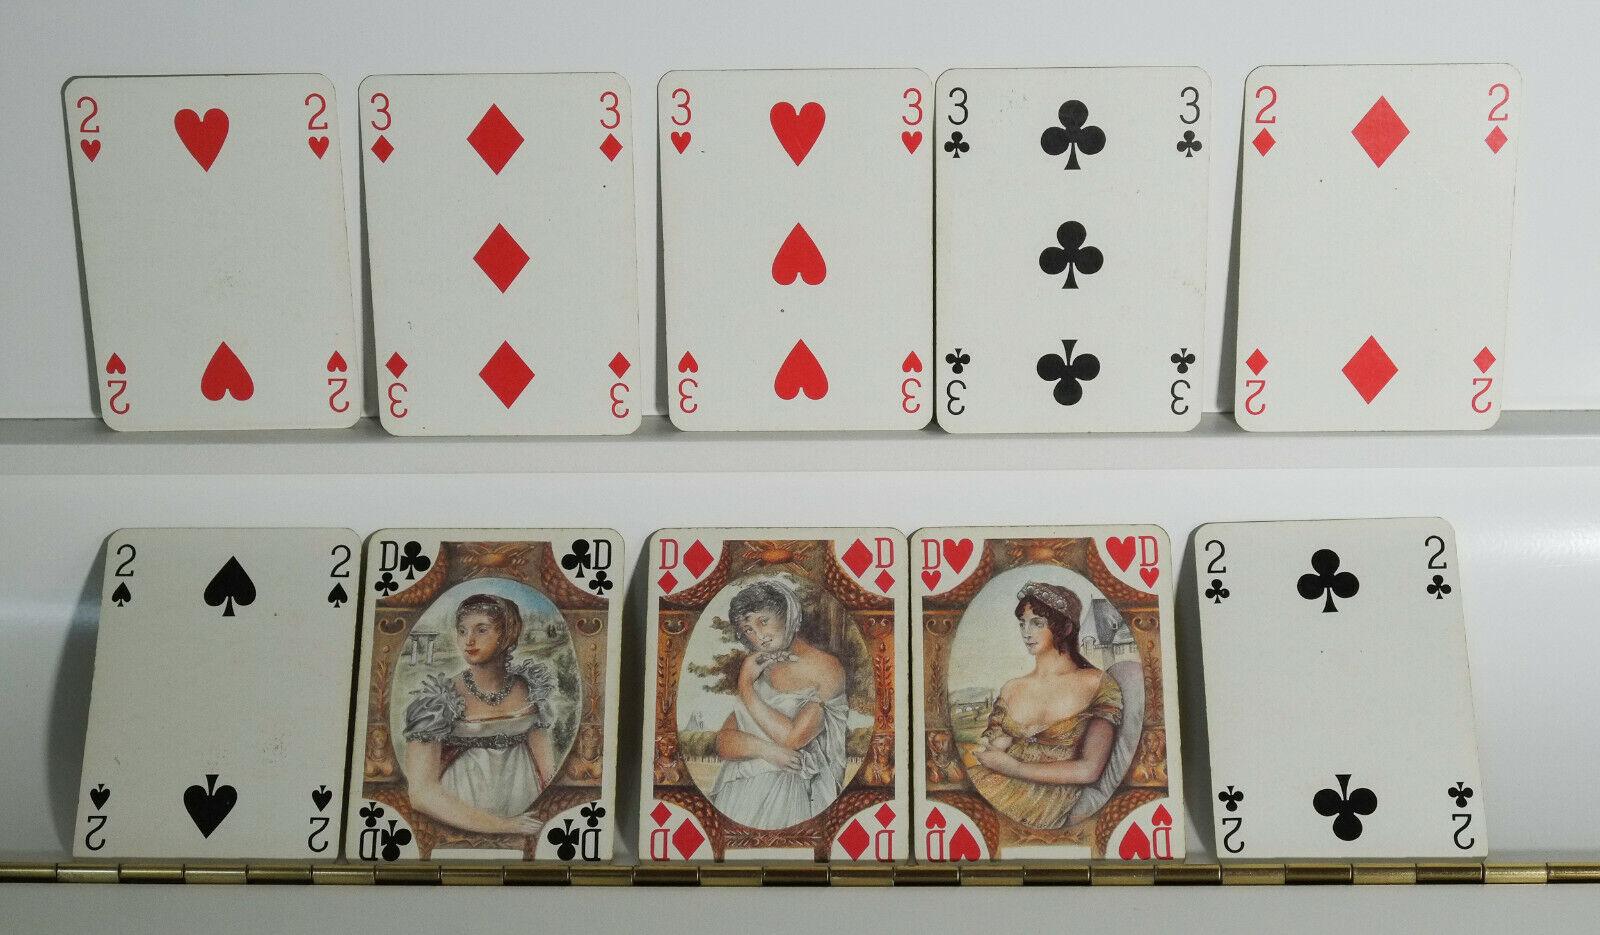 Jeux de carte, époque Napoléon III